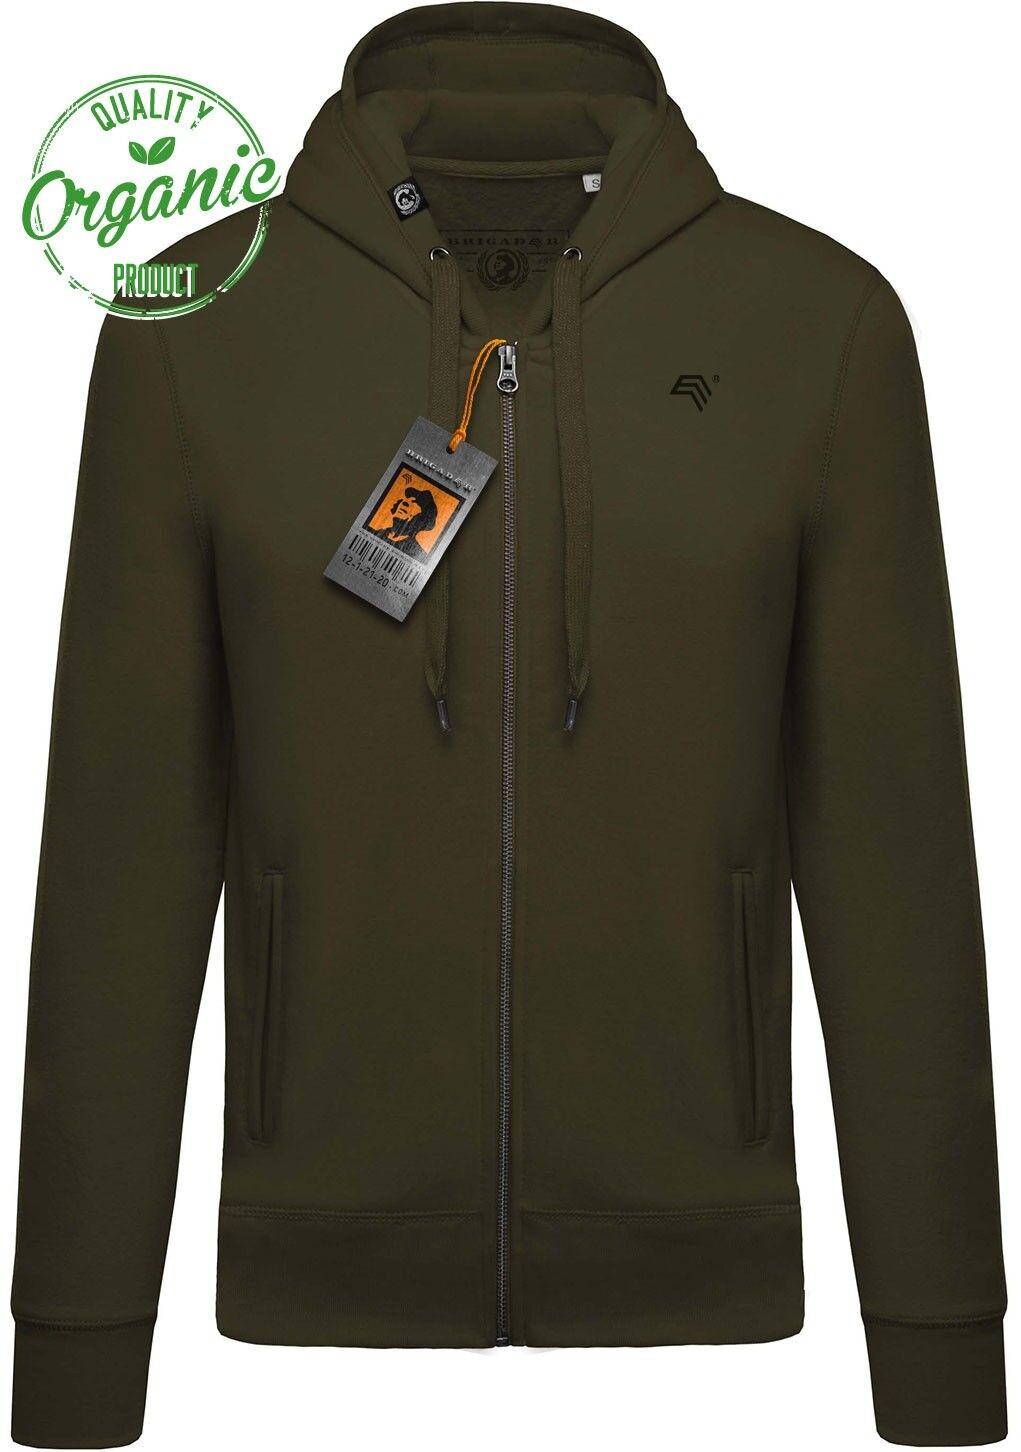 KRB k484 Bio Cotone kapuzensweatjacke Organic brigadeer hoodie, verde oliva